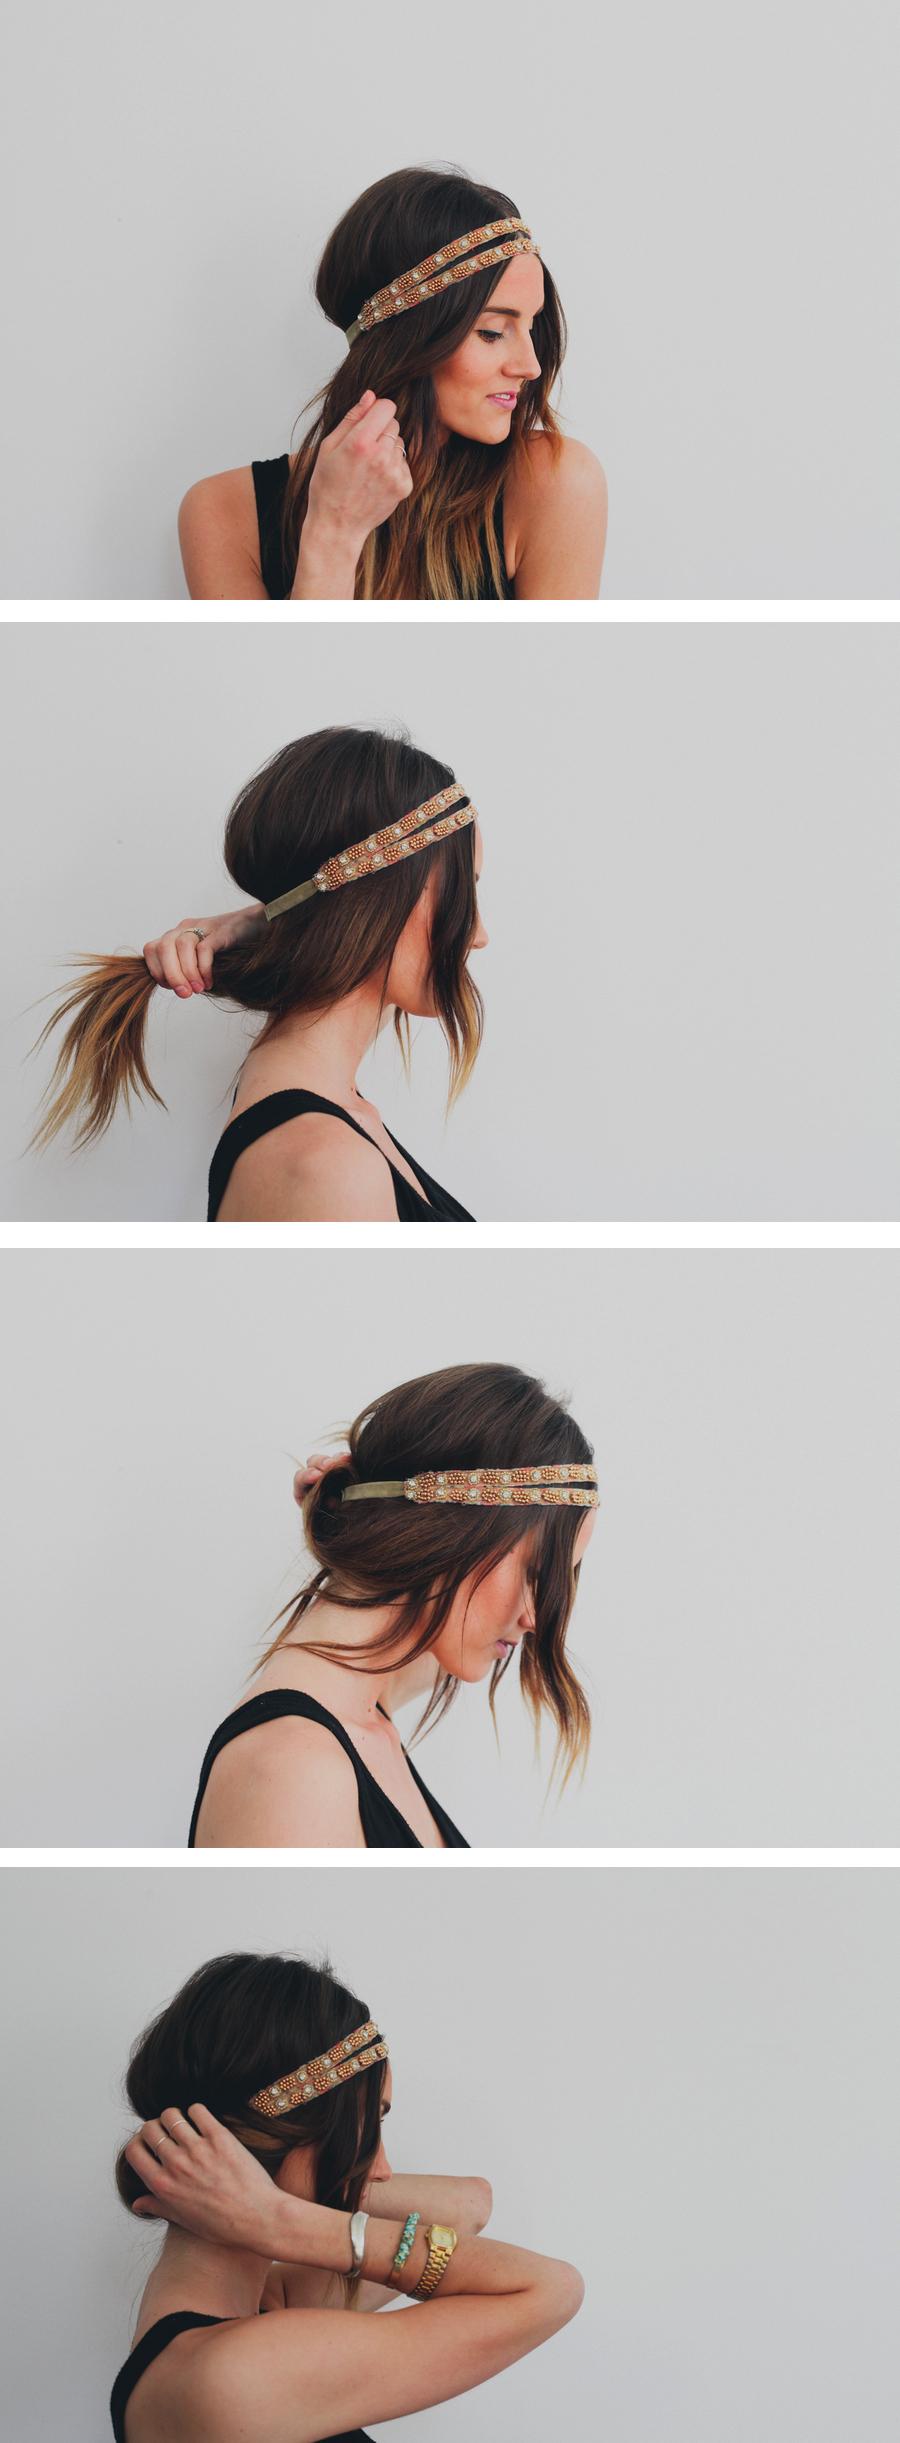 hair tutorial headband tuck treasures travels